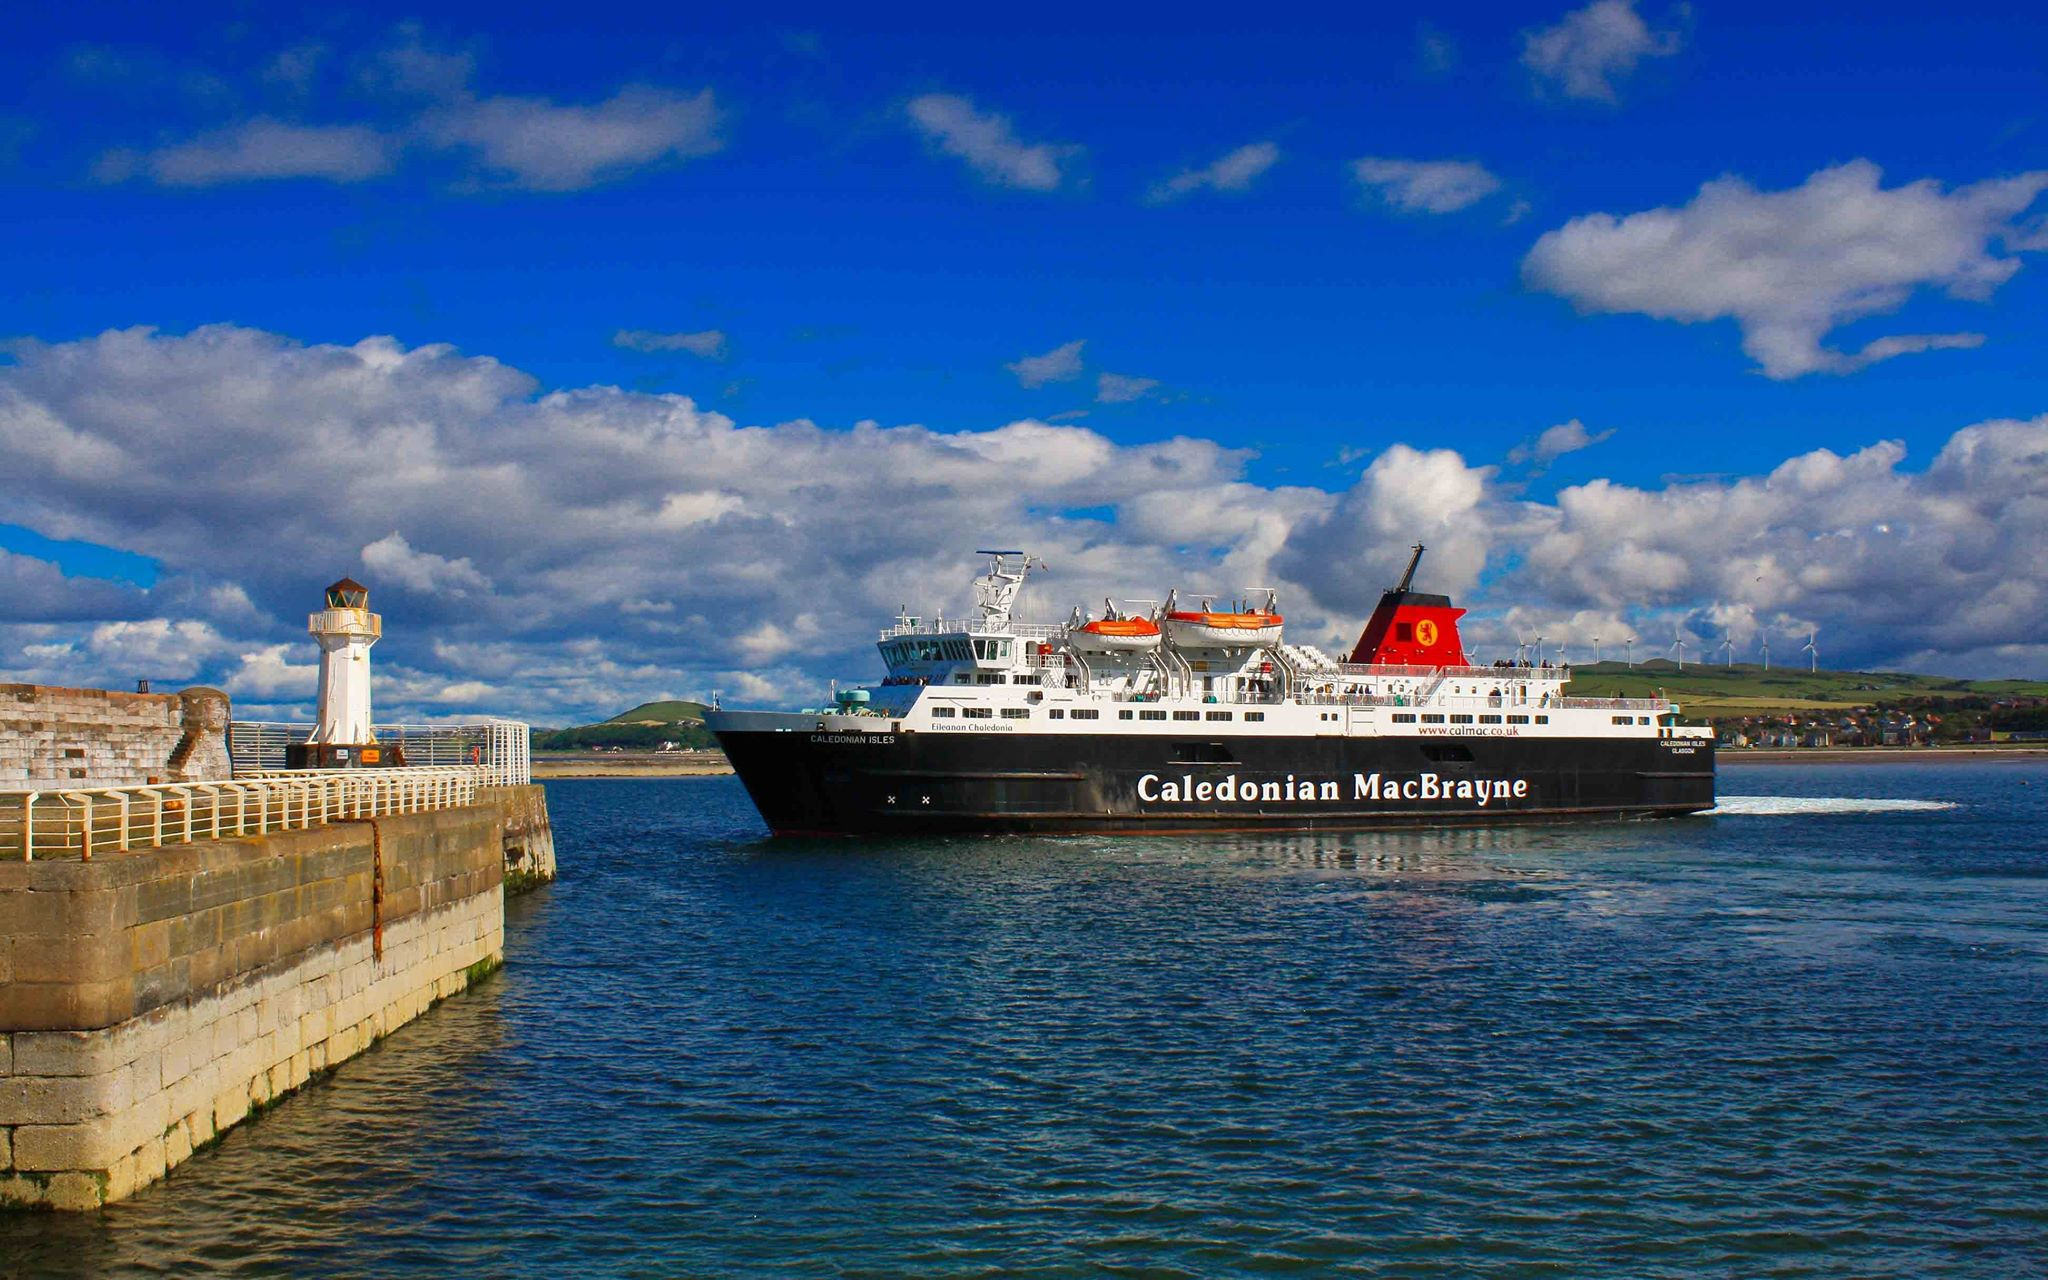 Caledonian Isles leaving Ardrossan (Ships of CalMac)